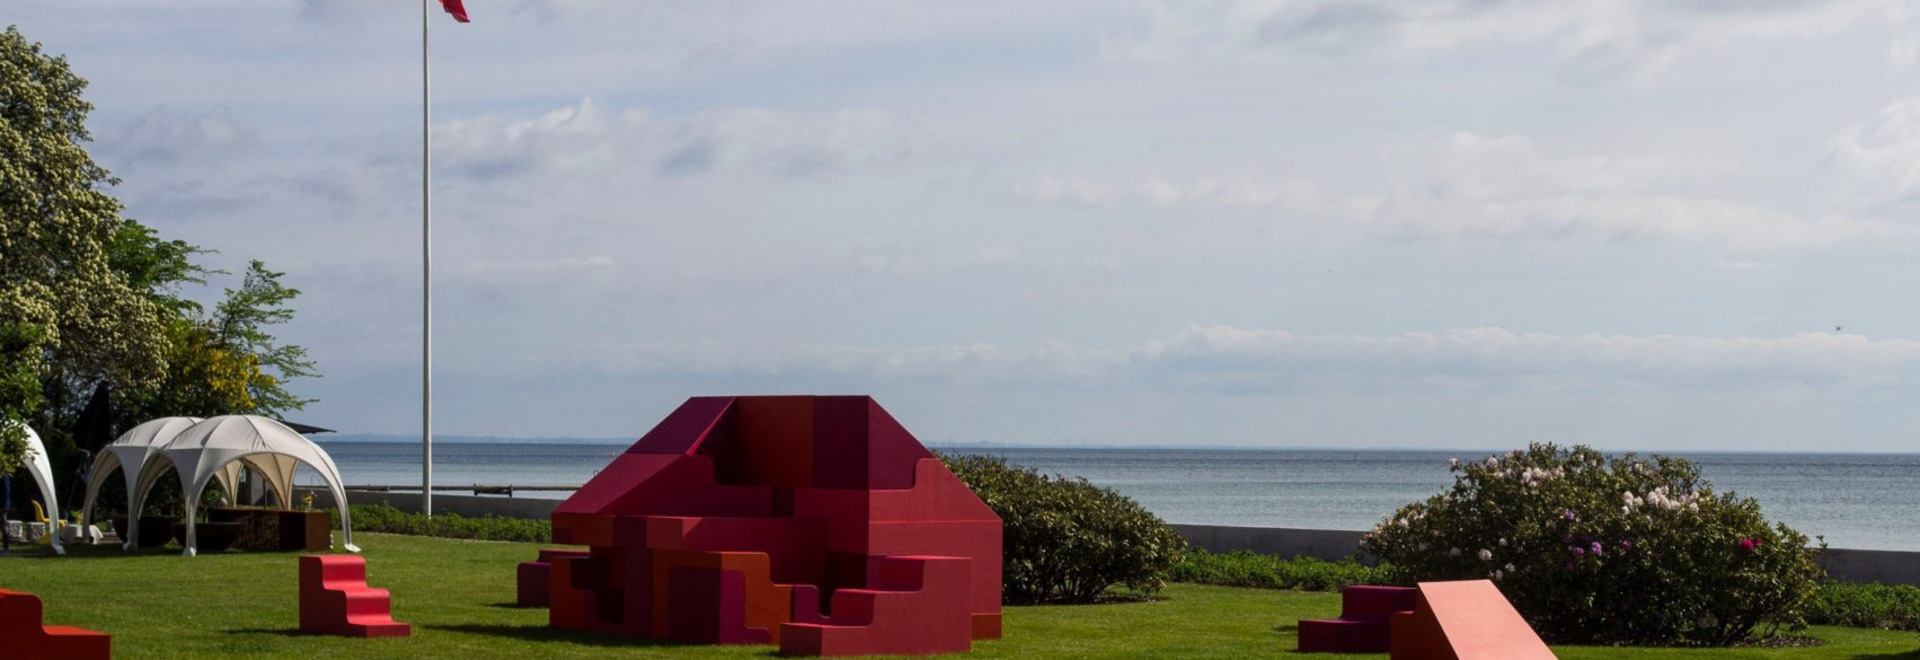 Bjarke Ingels e Simon Frommenwiler costruire casa puzzle-puzzle a Copenaghen